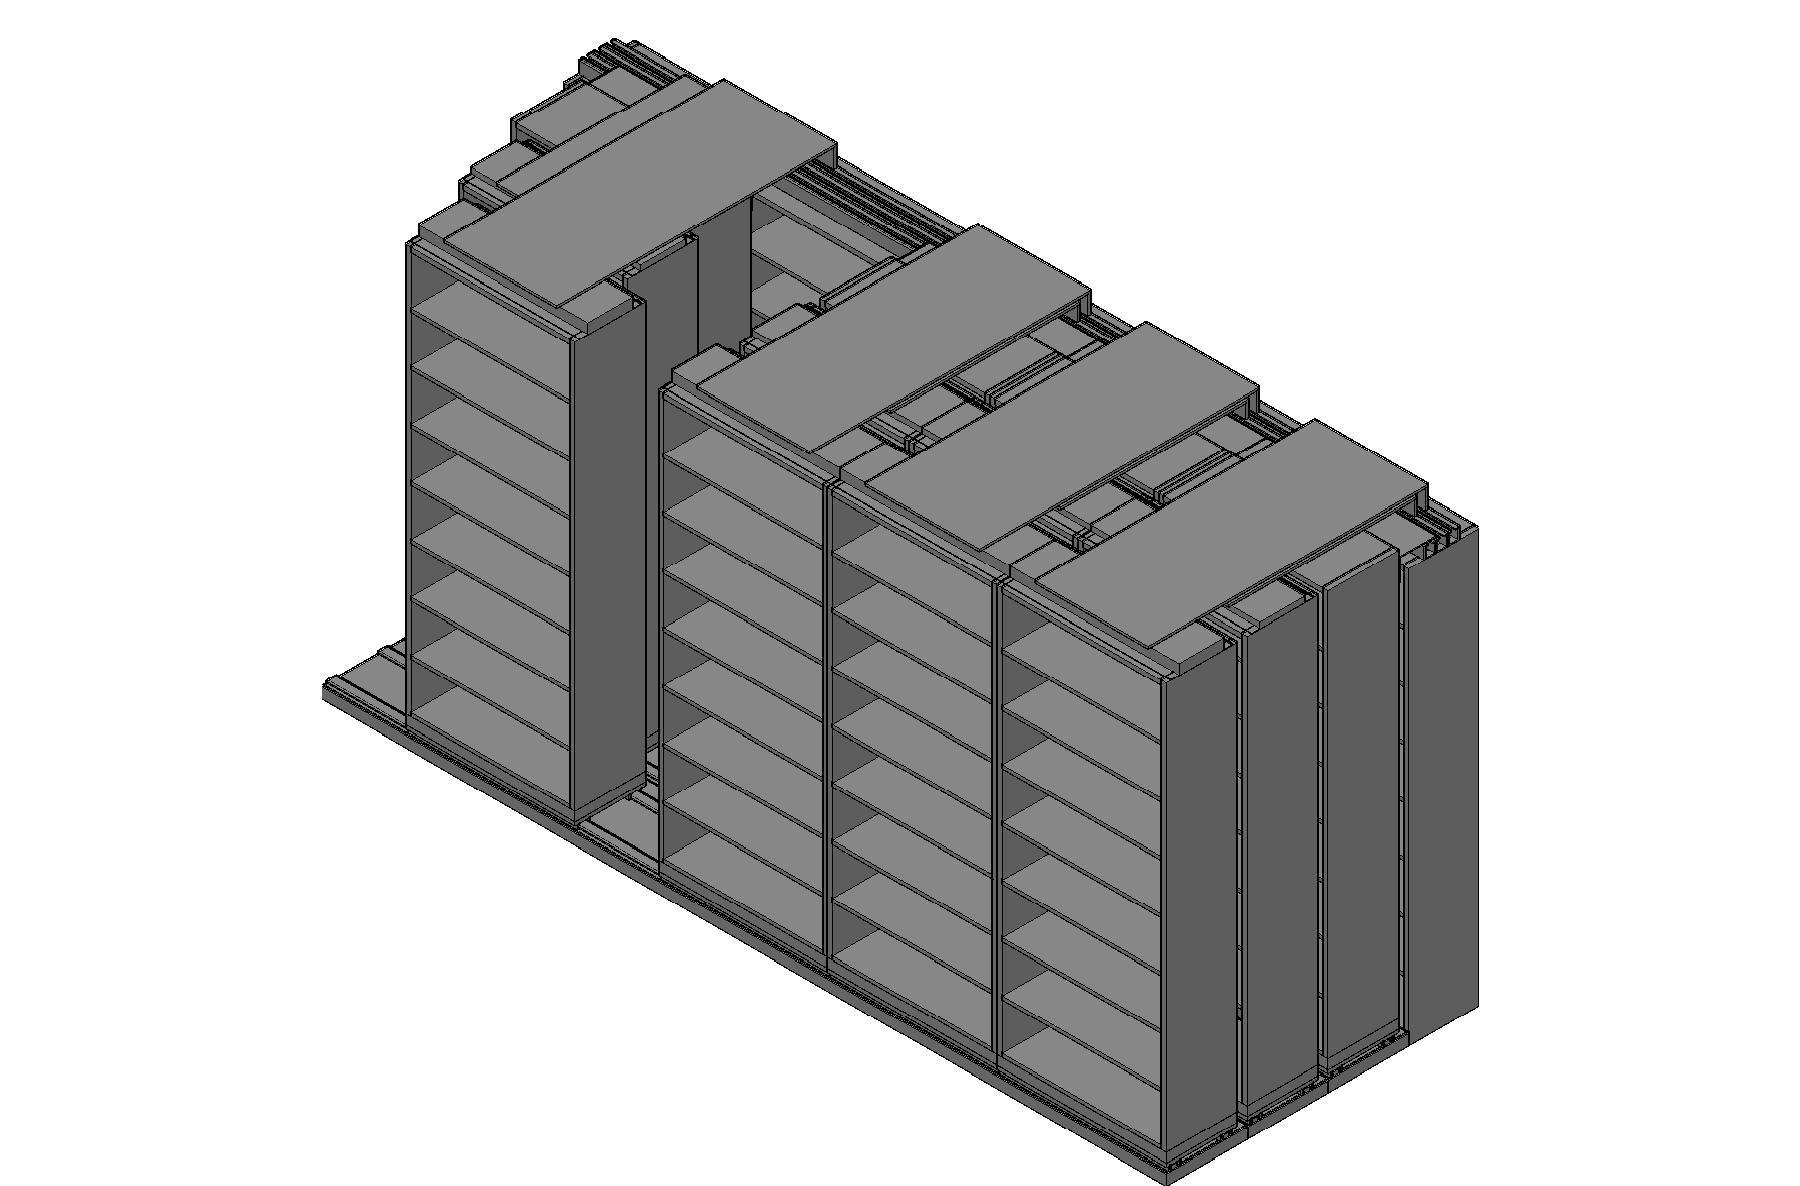 "Legal Size Sliding Shelves - 4 Rows Deep - 8 Levels - (36"" x 15"" Shelves) - 184"" Total Width"